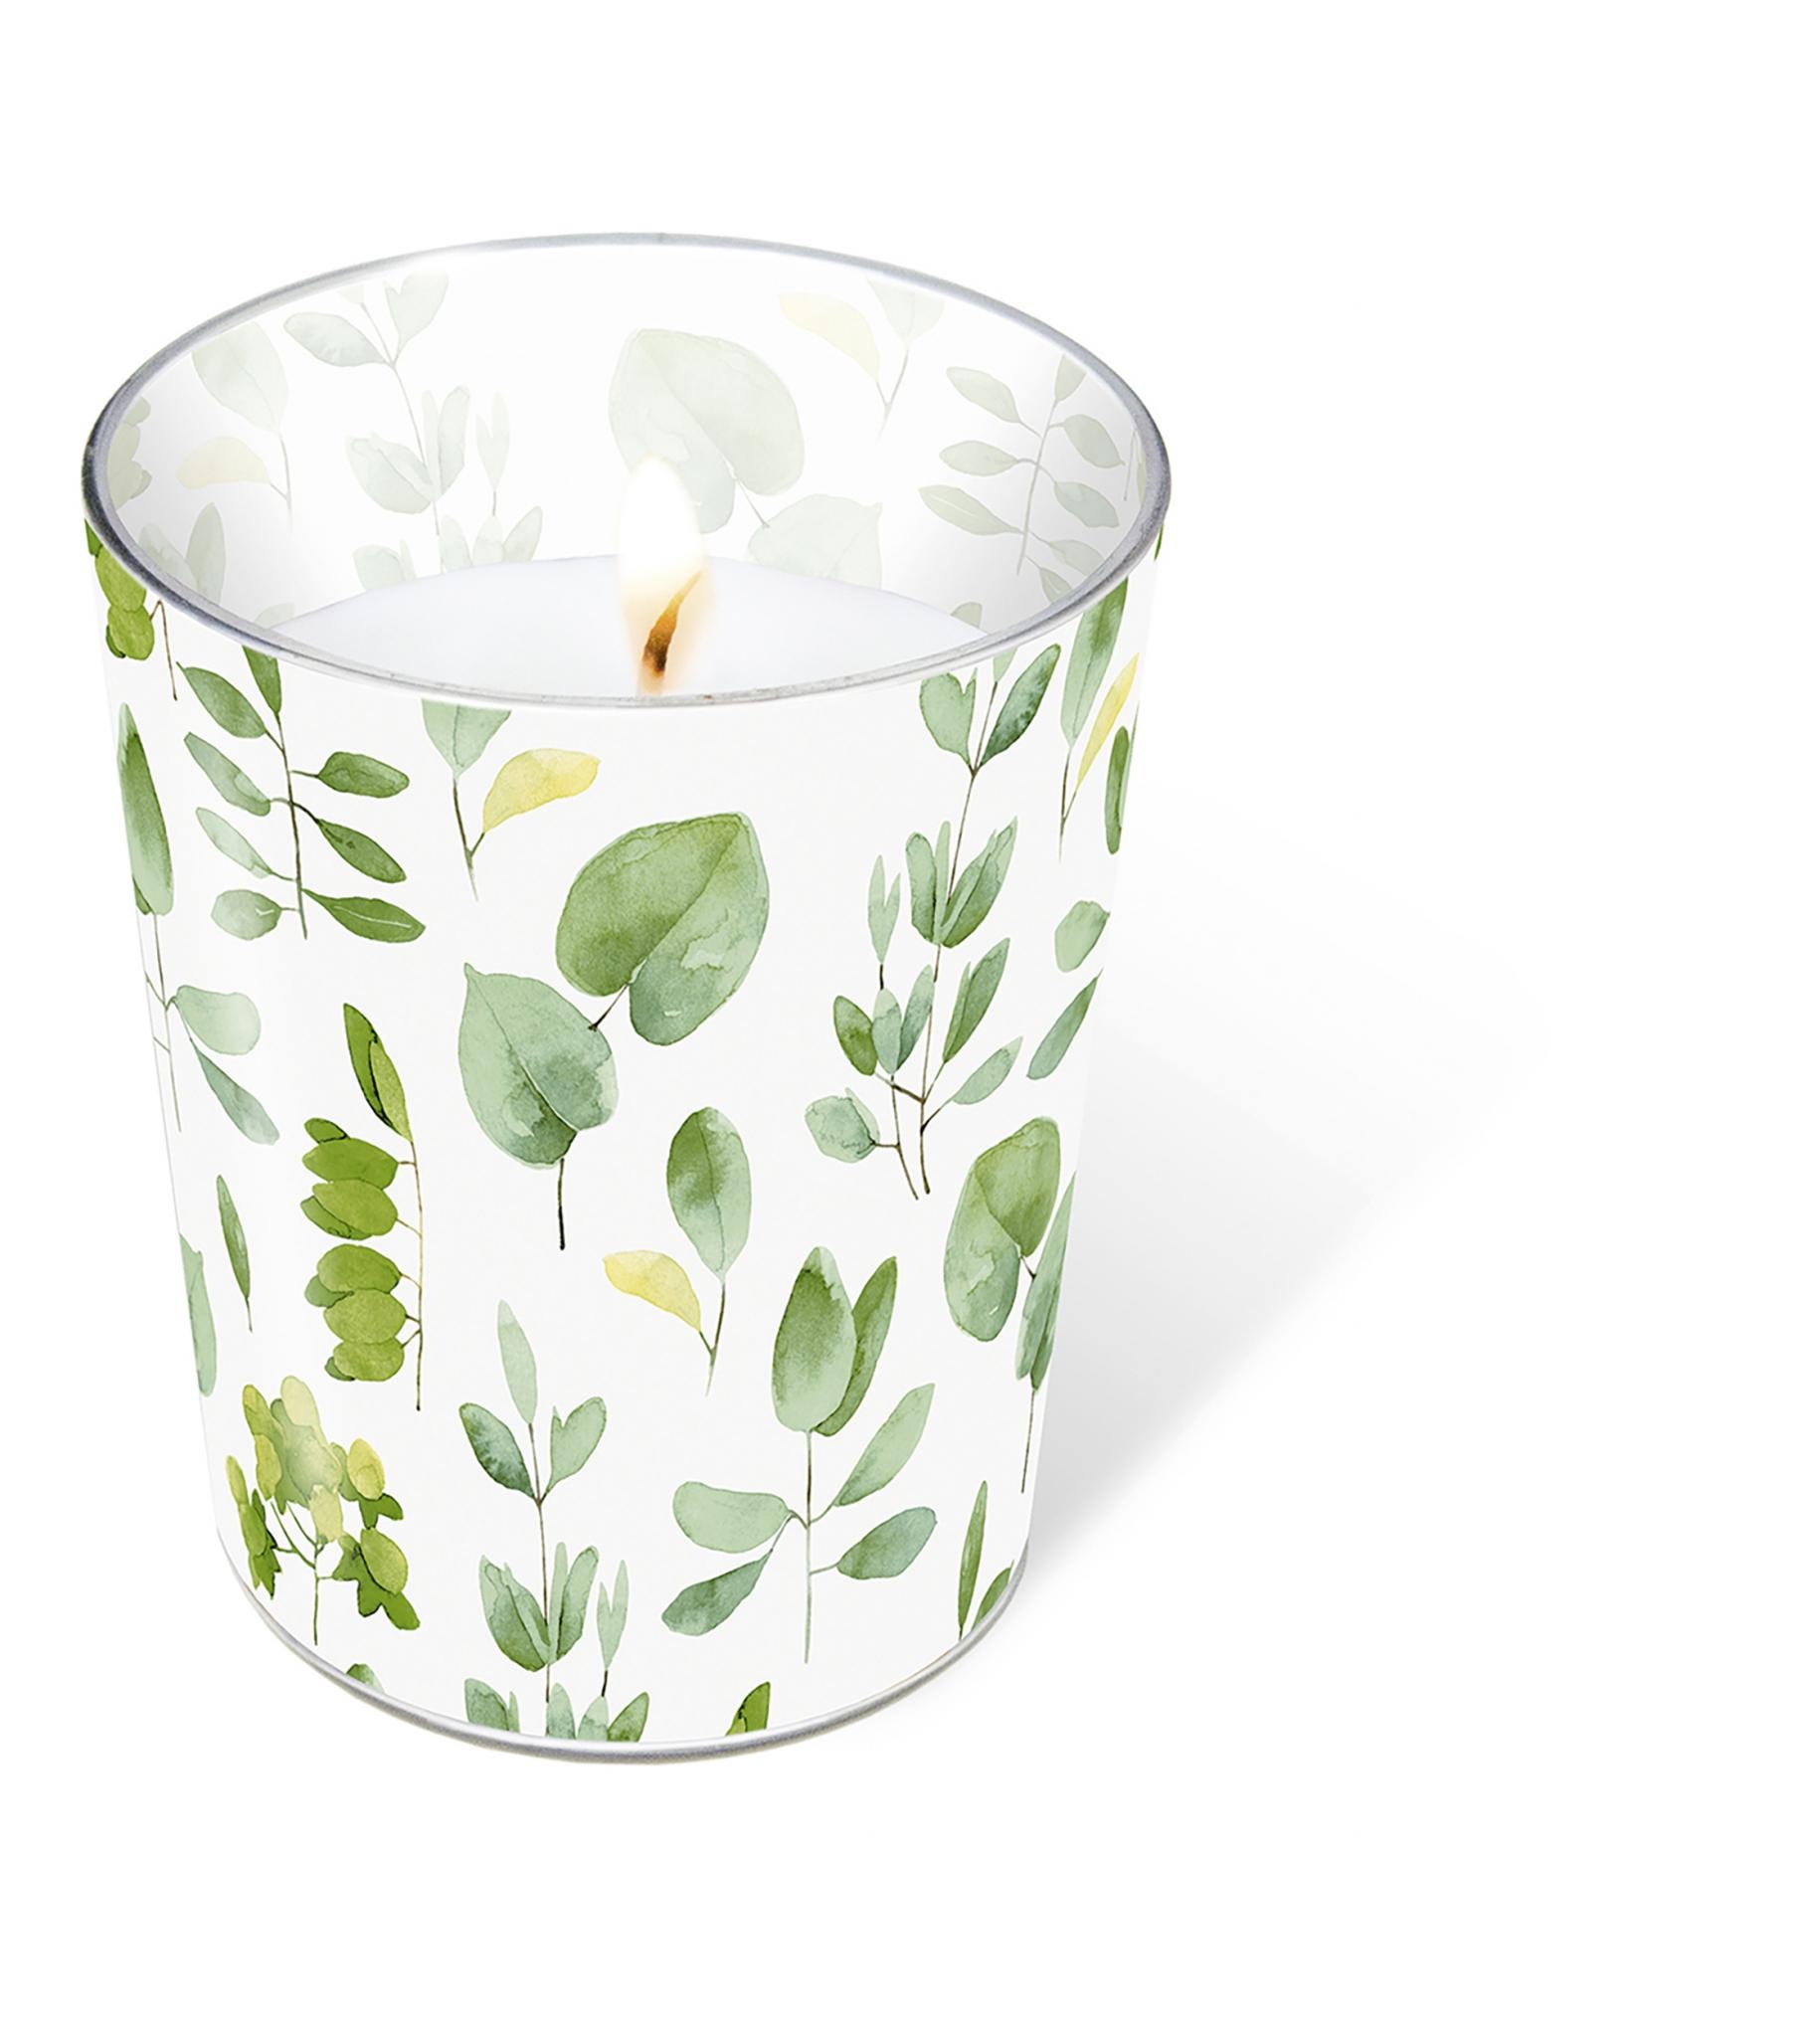 vela de vidrio - Fresh leaves